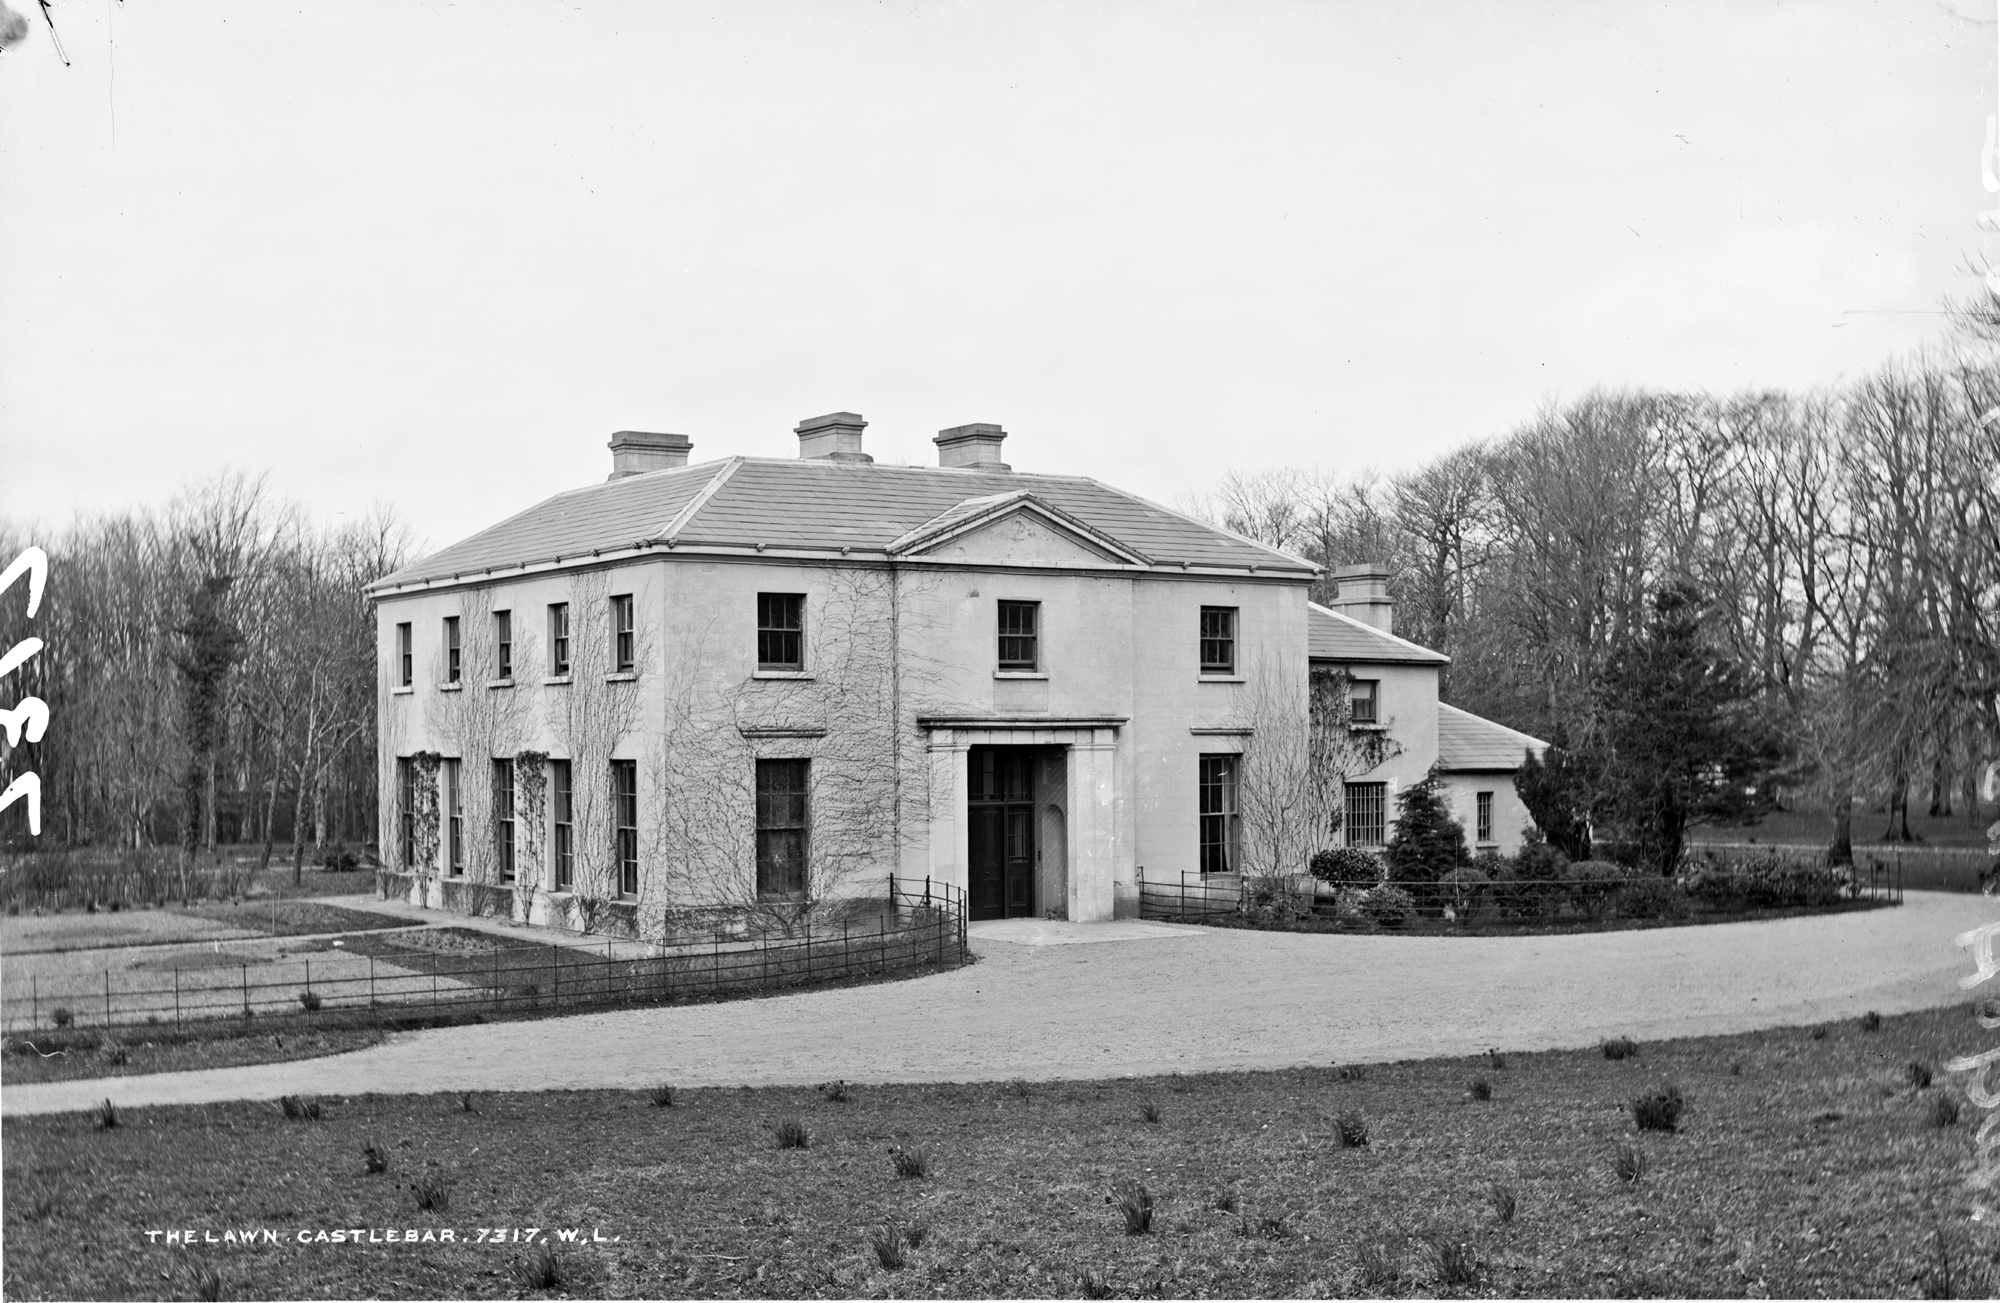 Lawn, Castlebar, Co. Mayo